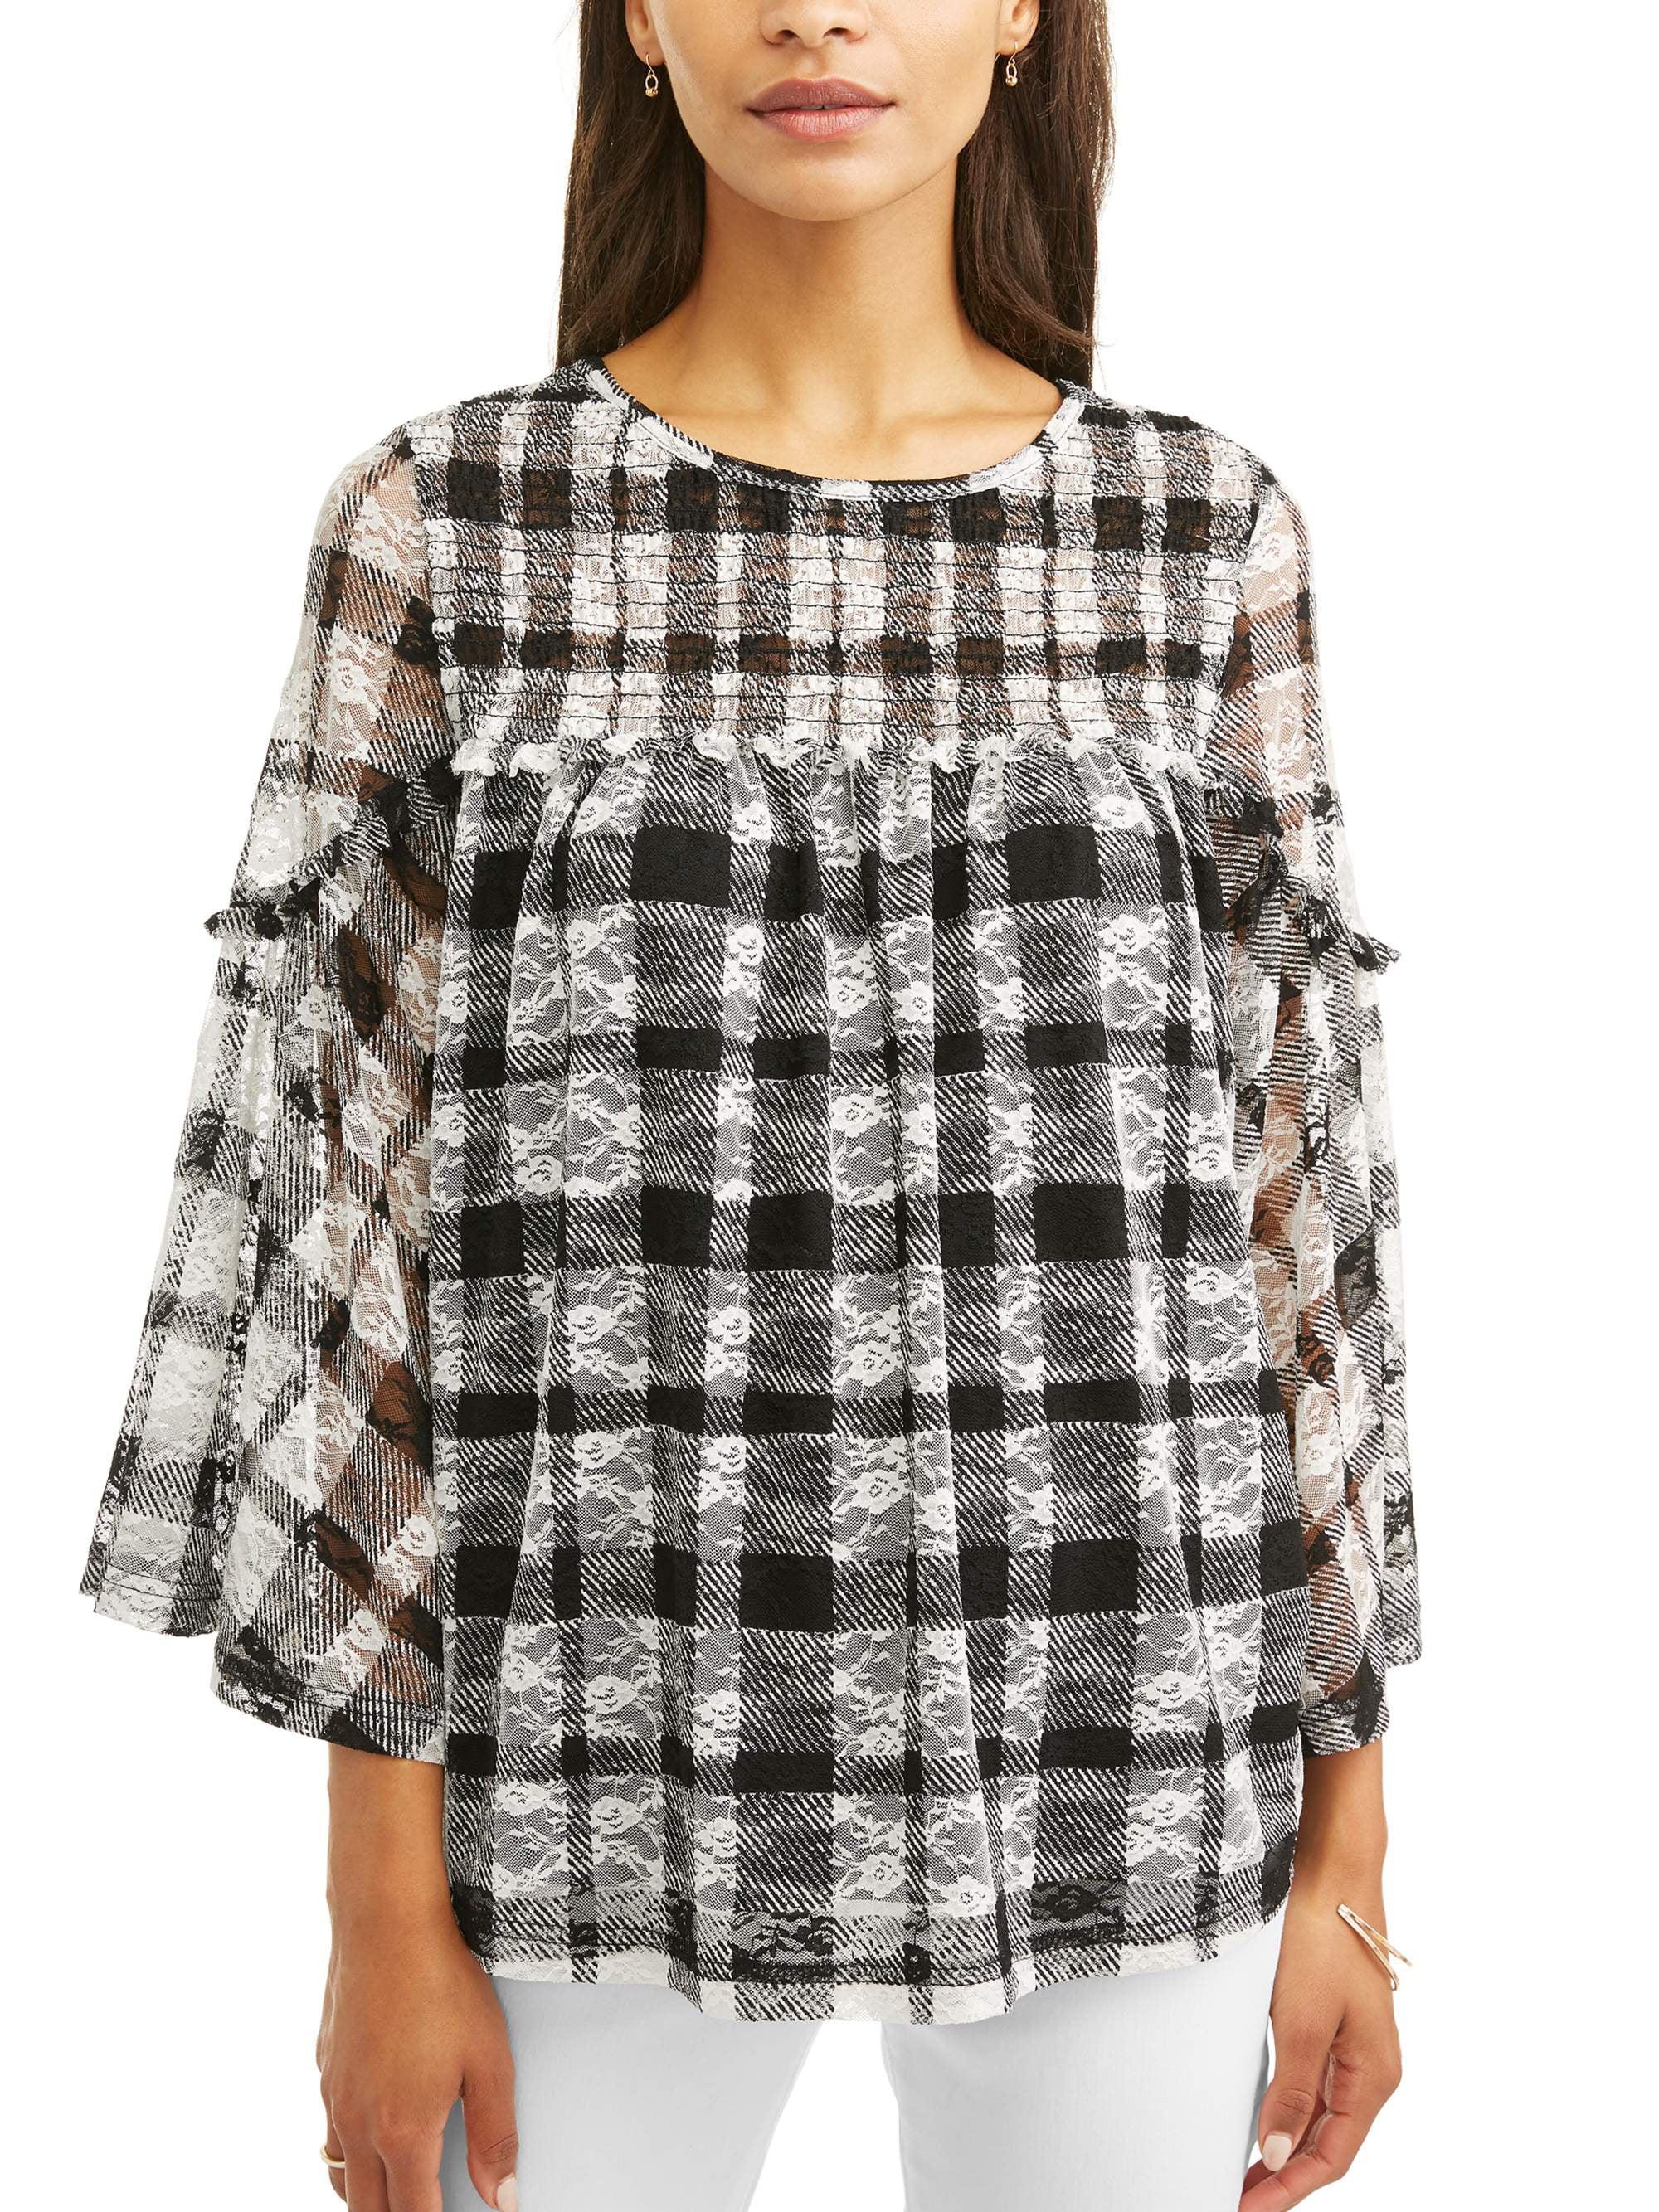 Women's Printed Lace Peasant Top